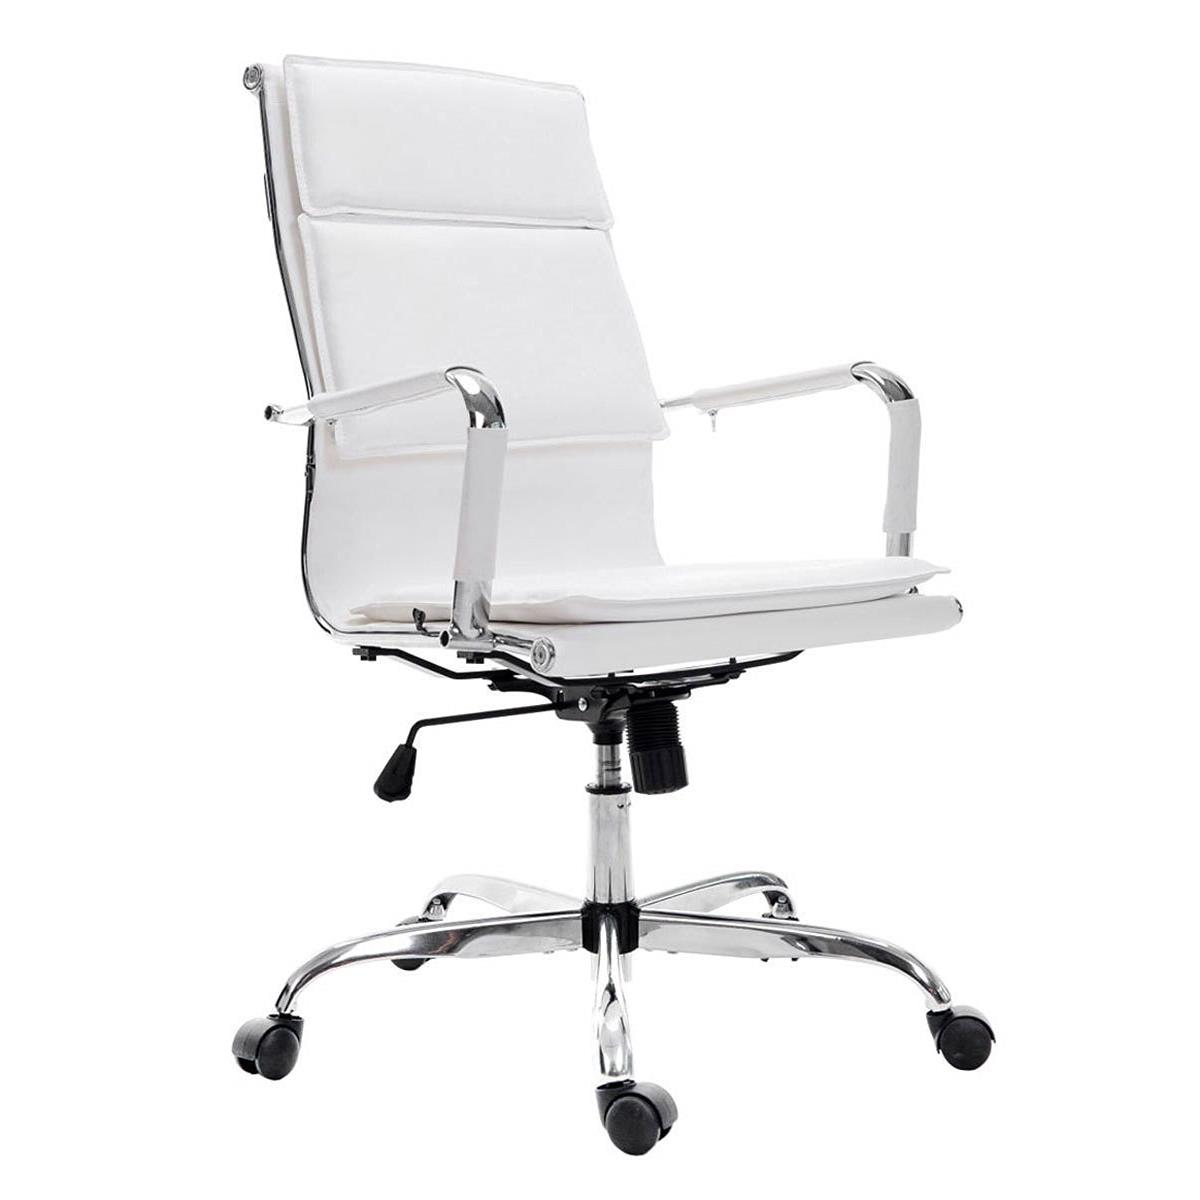 Silla de oficina anatolia en color blanco for Sillas de oficina ergonomicas baratas